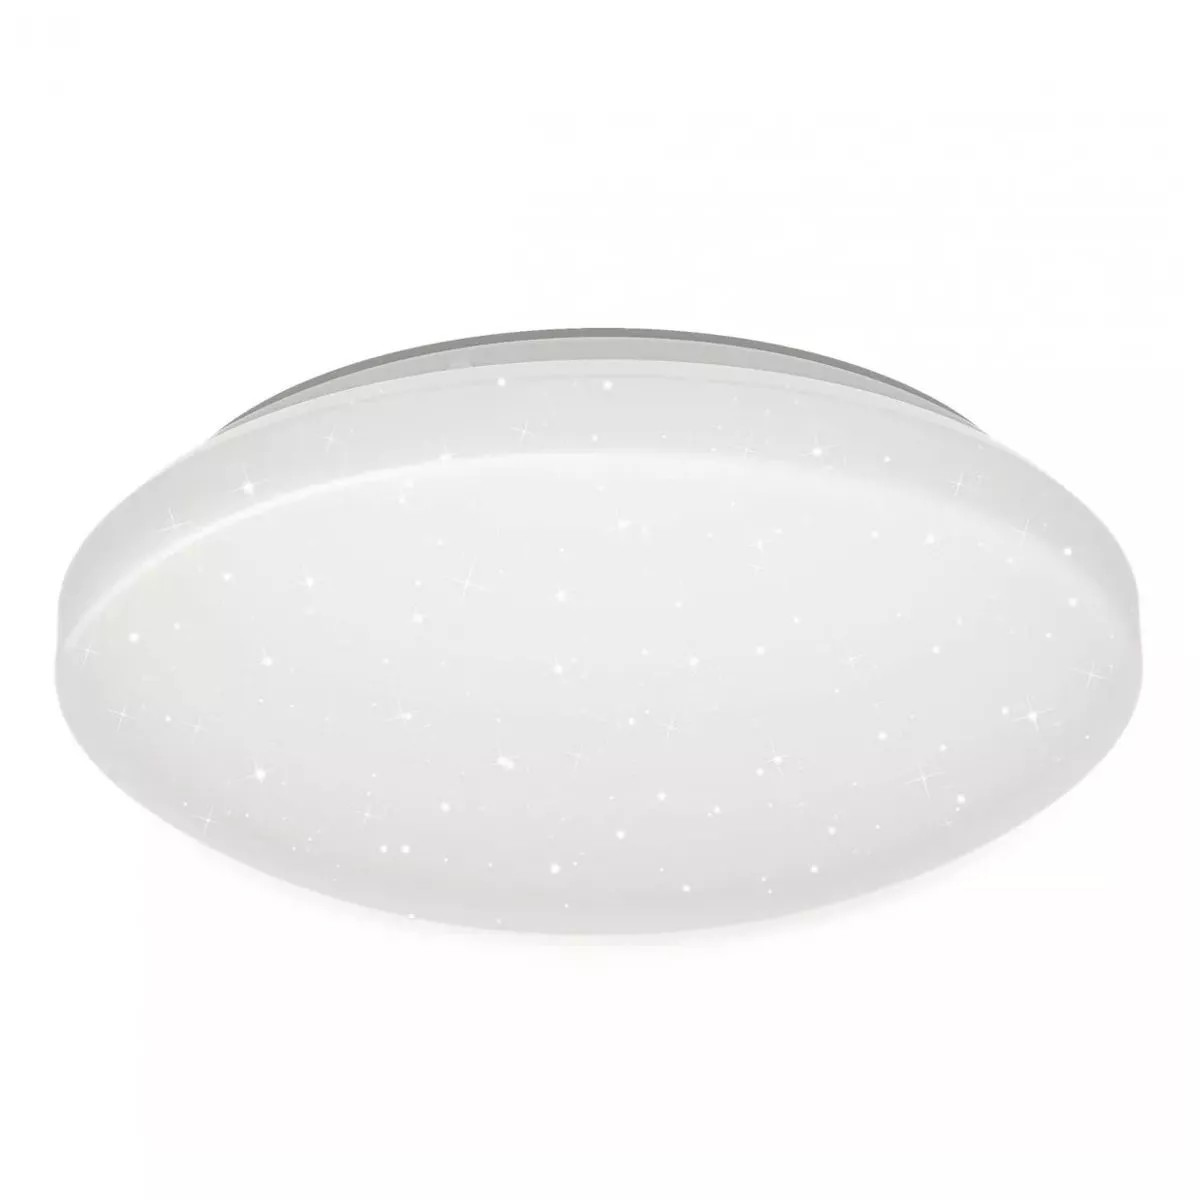 Plafon de Sobrepor Oval LED 20cm Branco - Taschibra